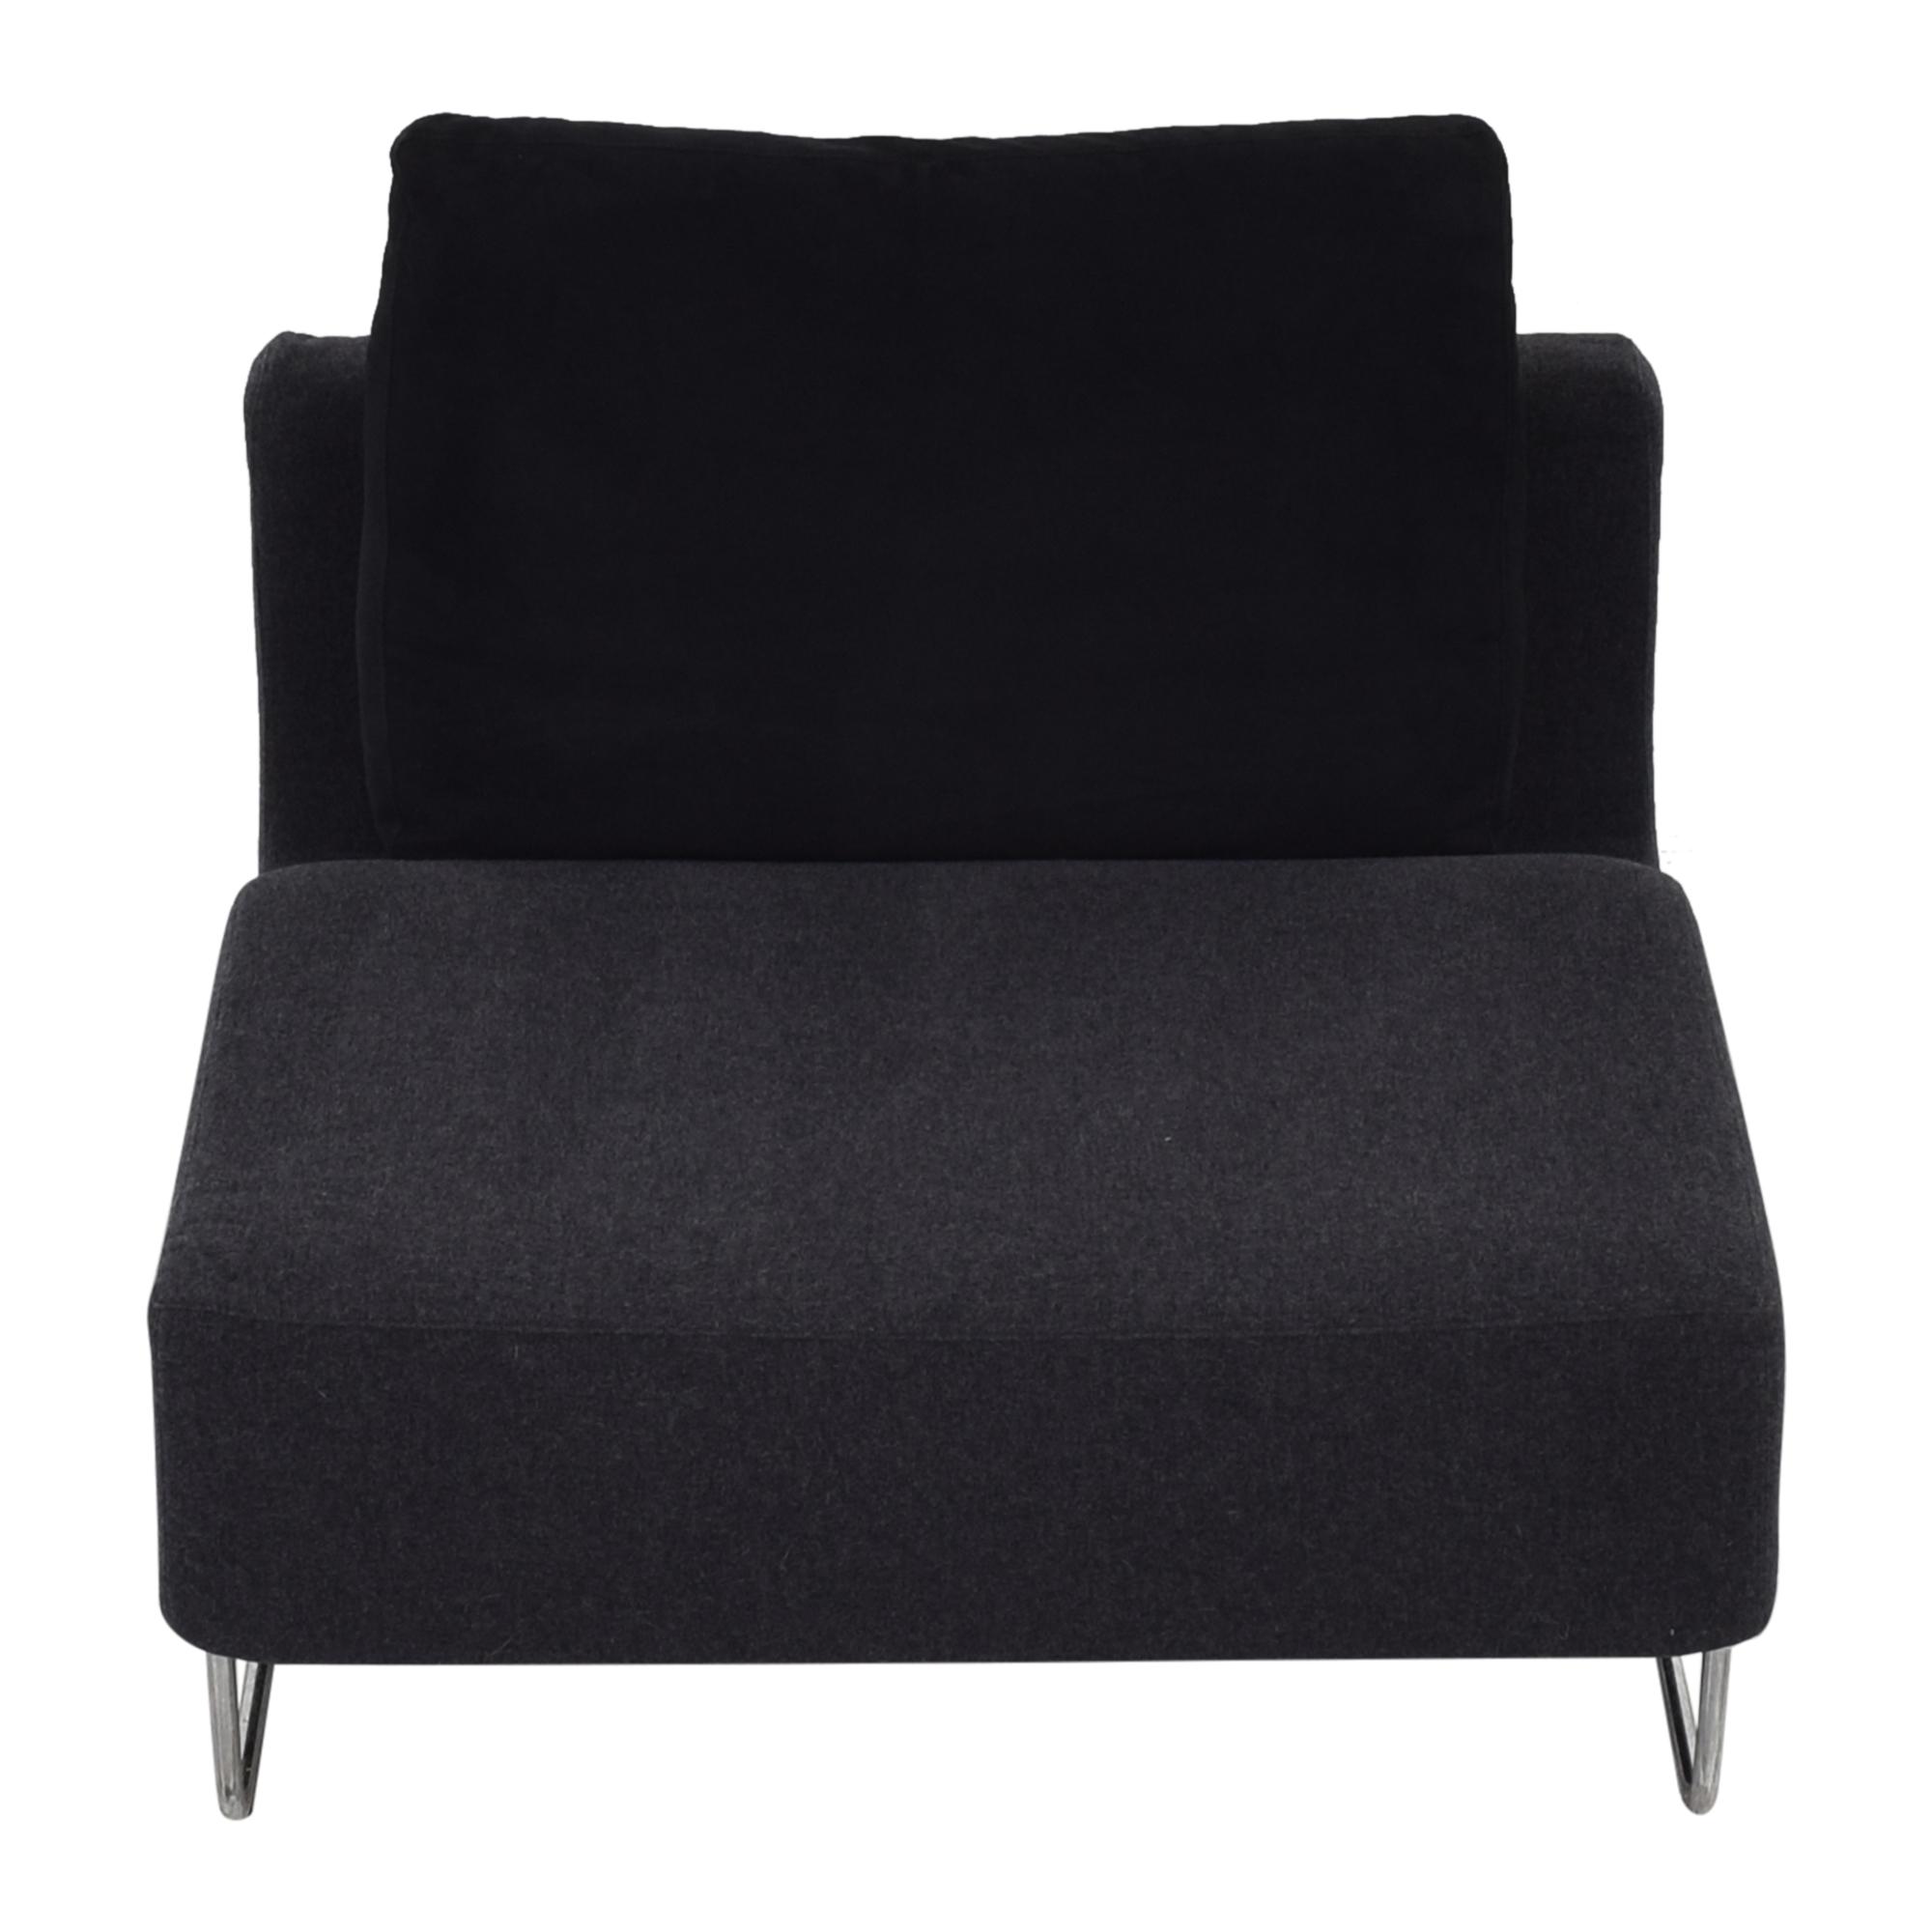 Bensen Bensen Canyon Lounge Chair black